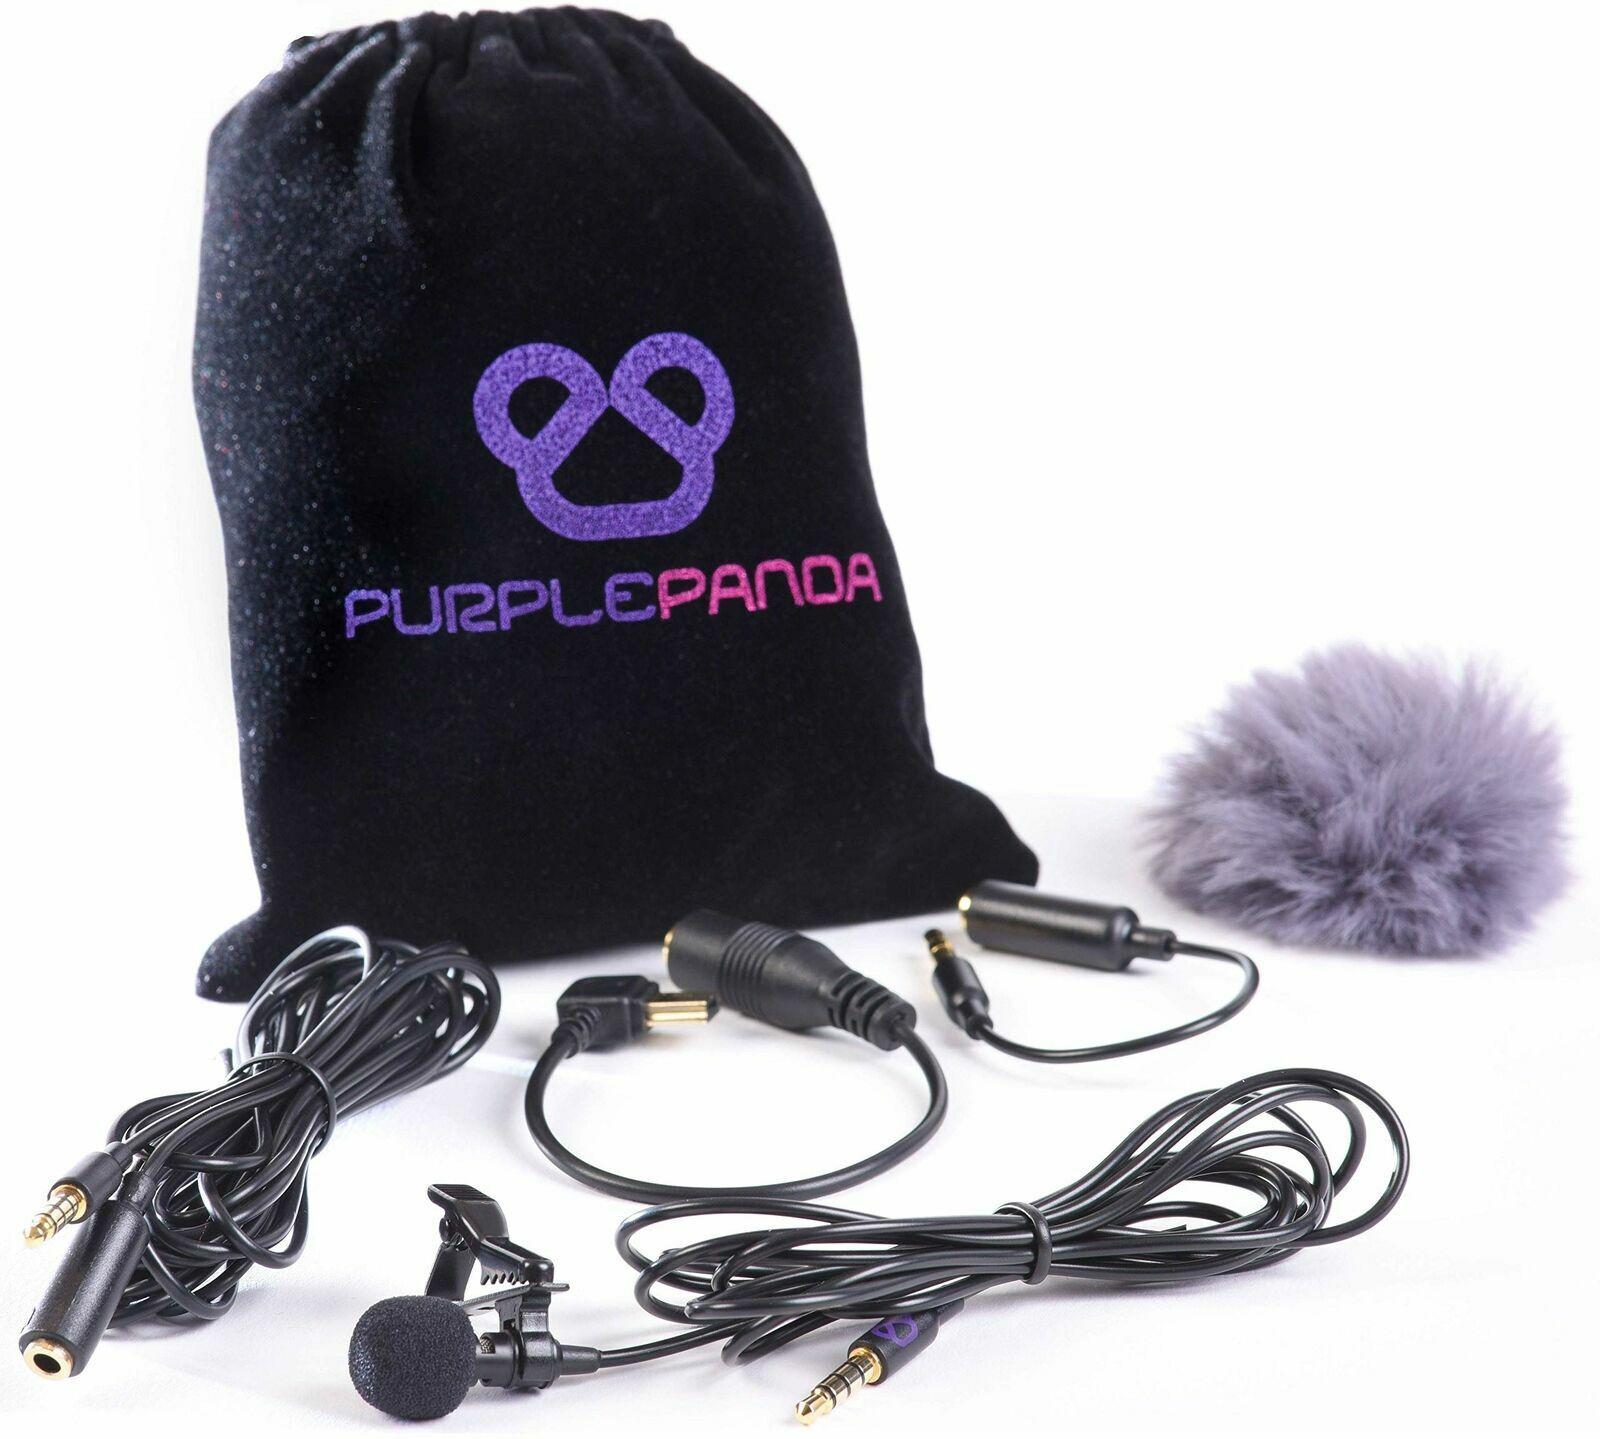 Purple Panda Lavalier Lapel Microphone Kit - Clip-on Omnidir